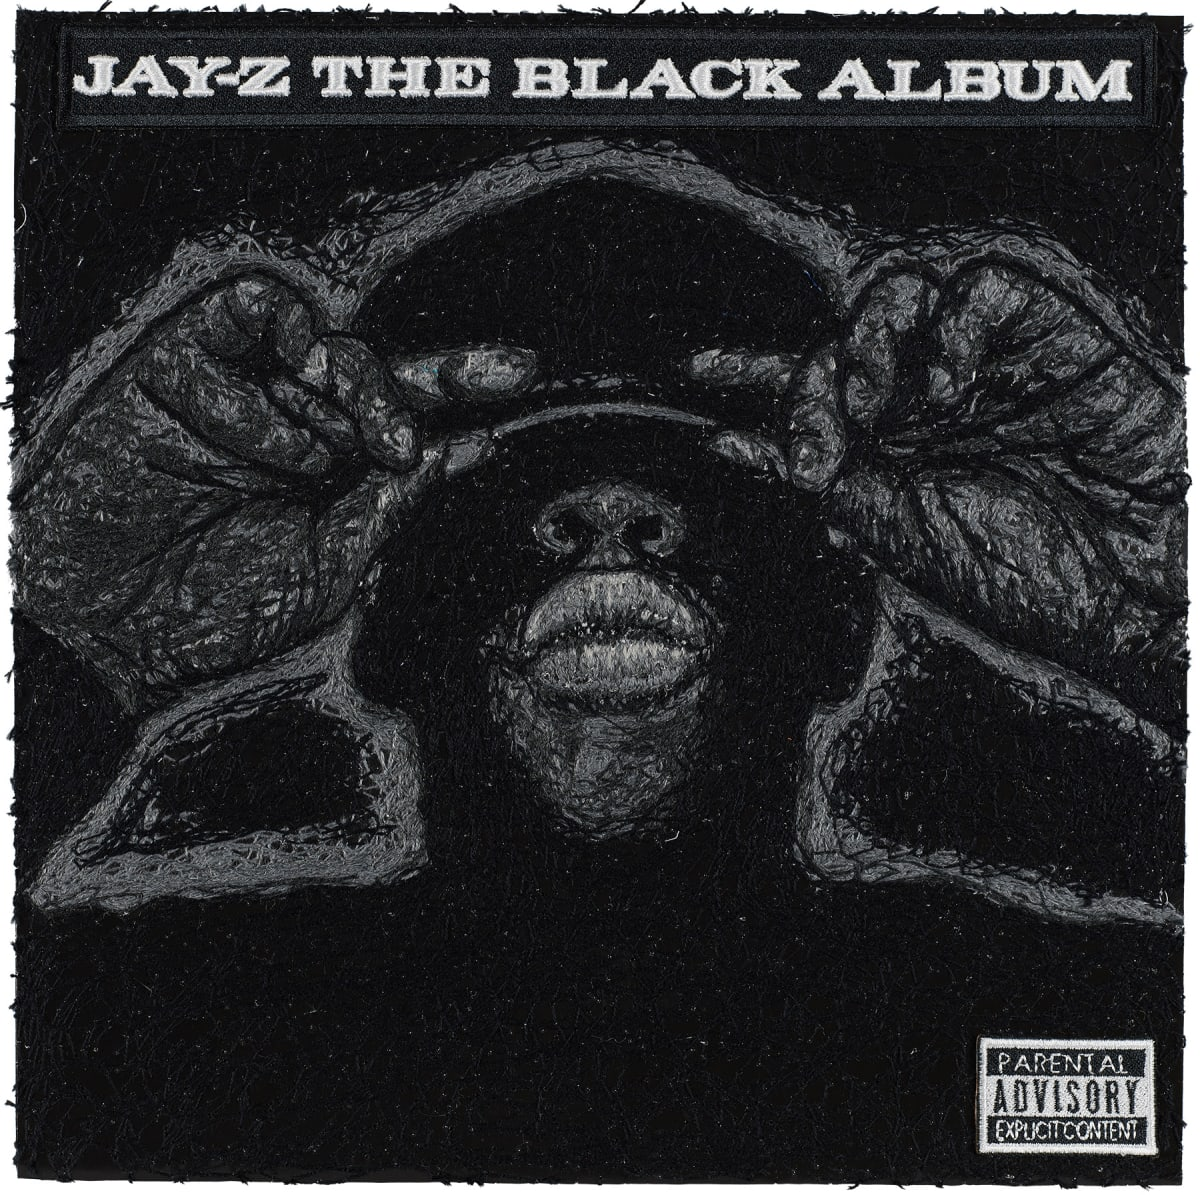 Stephen Wilson, The Black Album, Jay Z , 2019